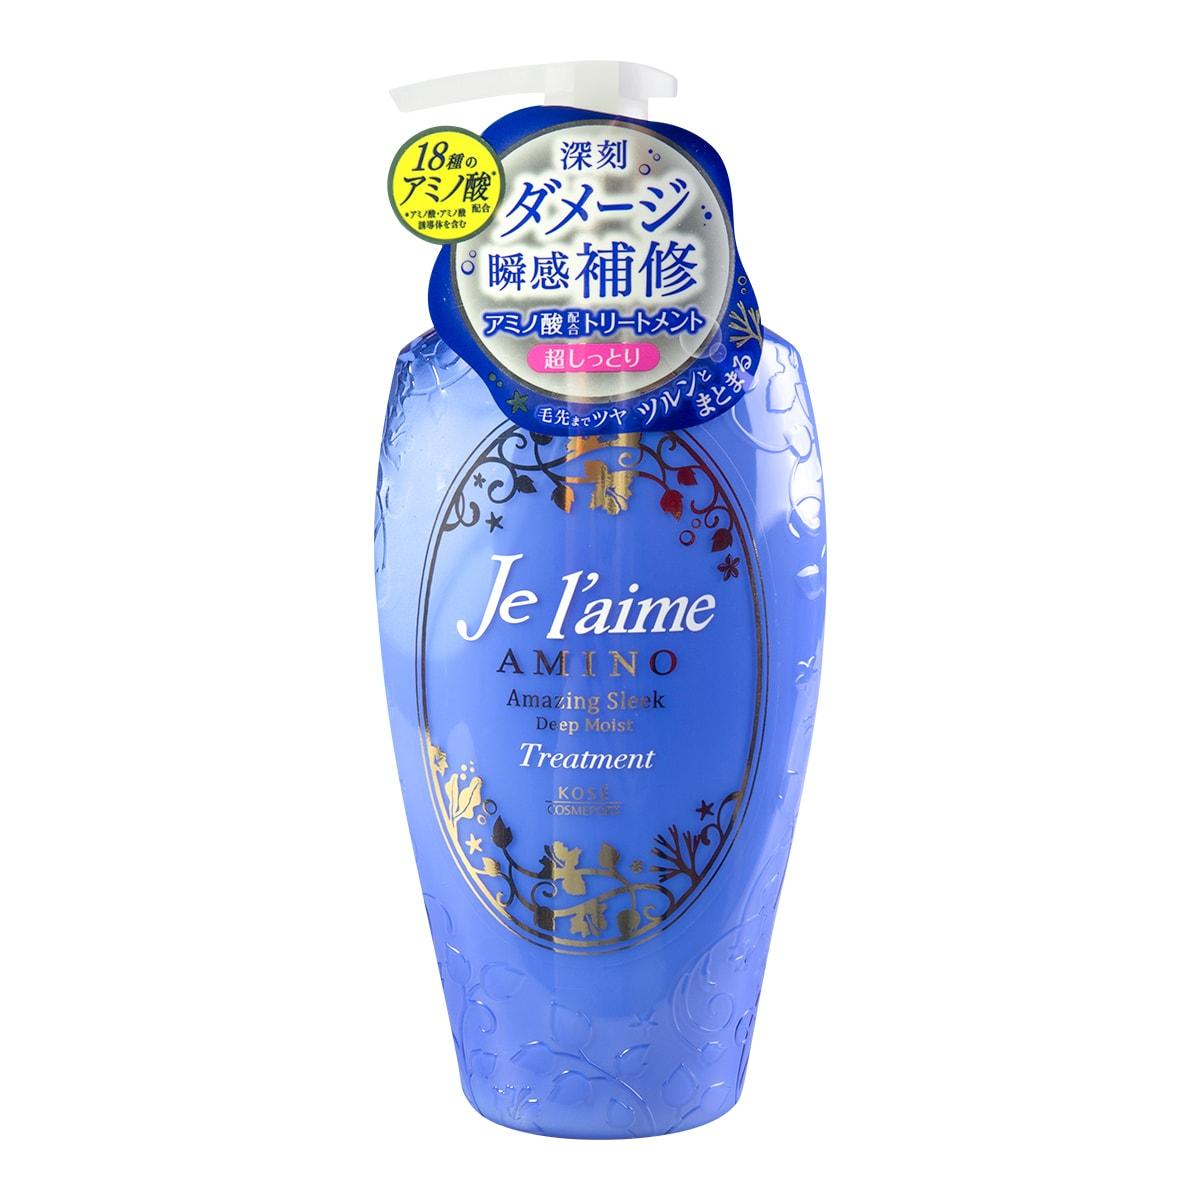 日本KOSE高丝 JE L'AIME AMINO 无硅氨基酸瞬间修复护发素 500ml 极度润泽柔滑型